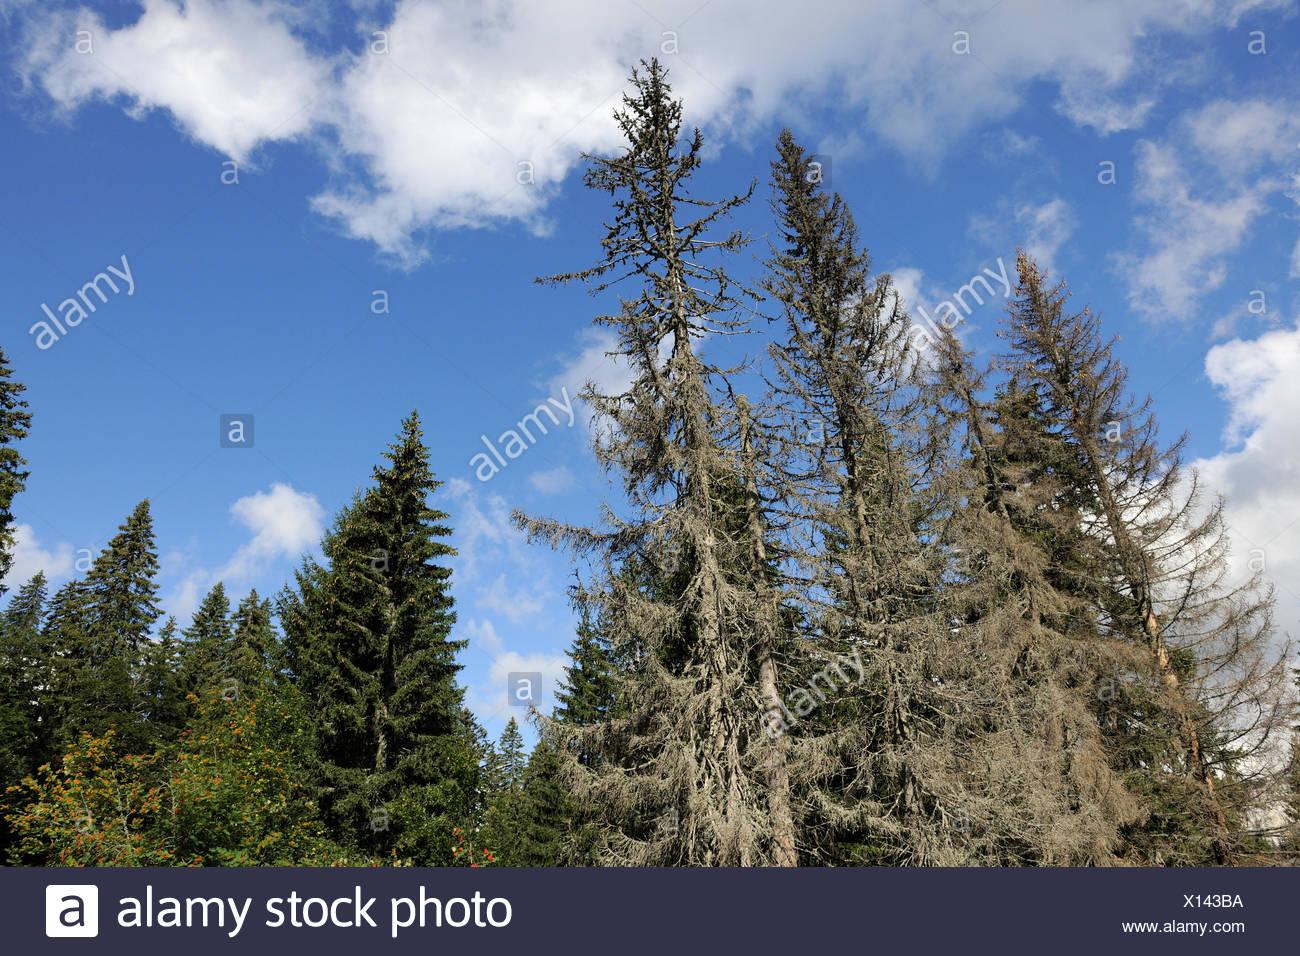 Trees dying from  bark beetle infestation, North Velebit National Park, Velebit Nature Park, Dalmatian coast, Adriatic sea, Croatia - Stock Image